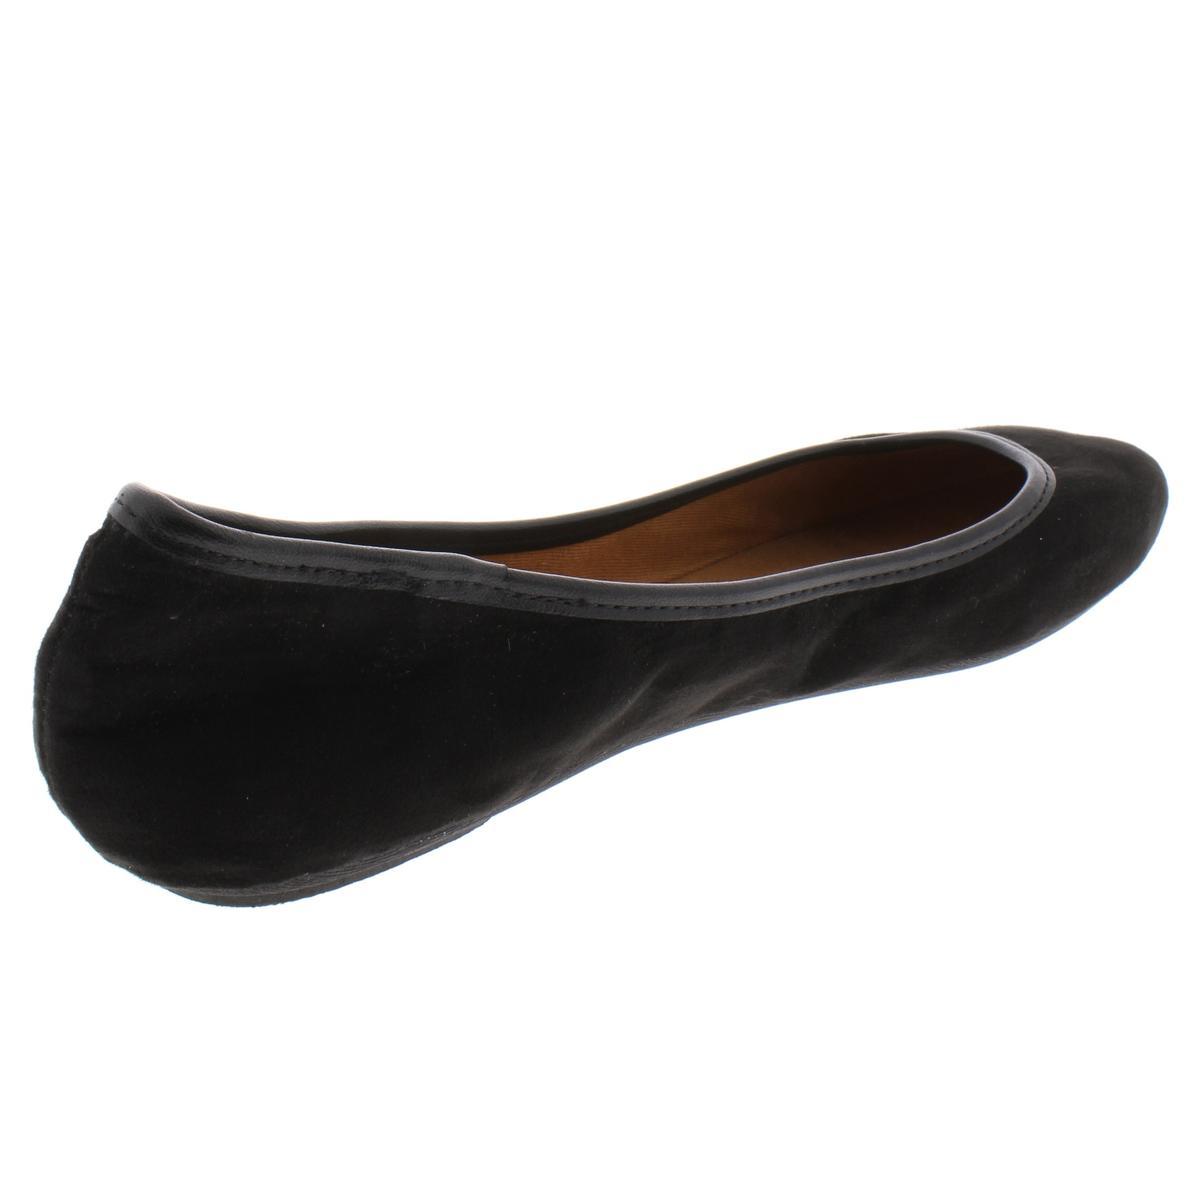 American-Rag-Womens-Cellia-Contrast-Trim-Slip-On-Ballet-Flats-Shoes-BHFO-6452 thumbnail 4